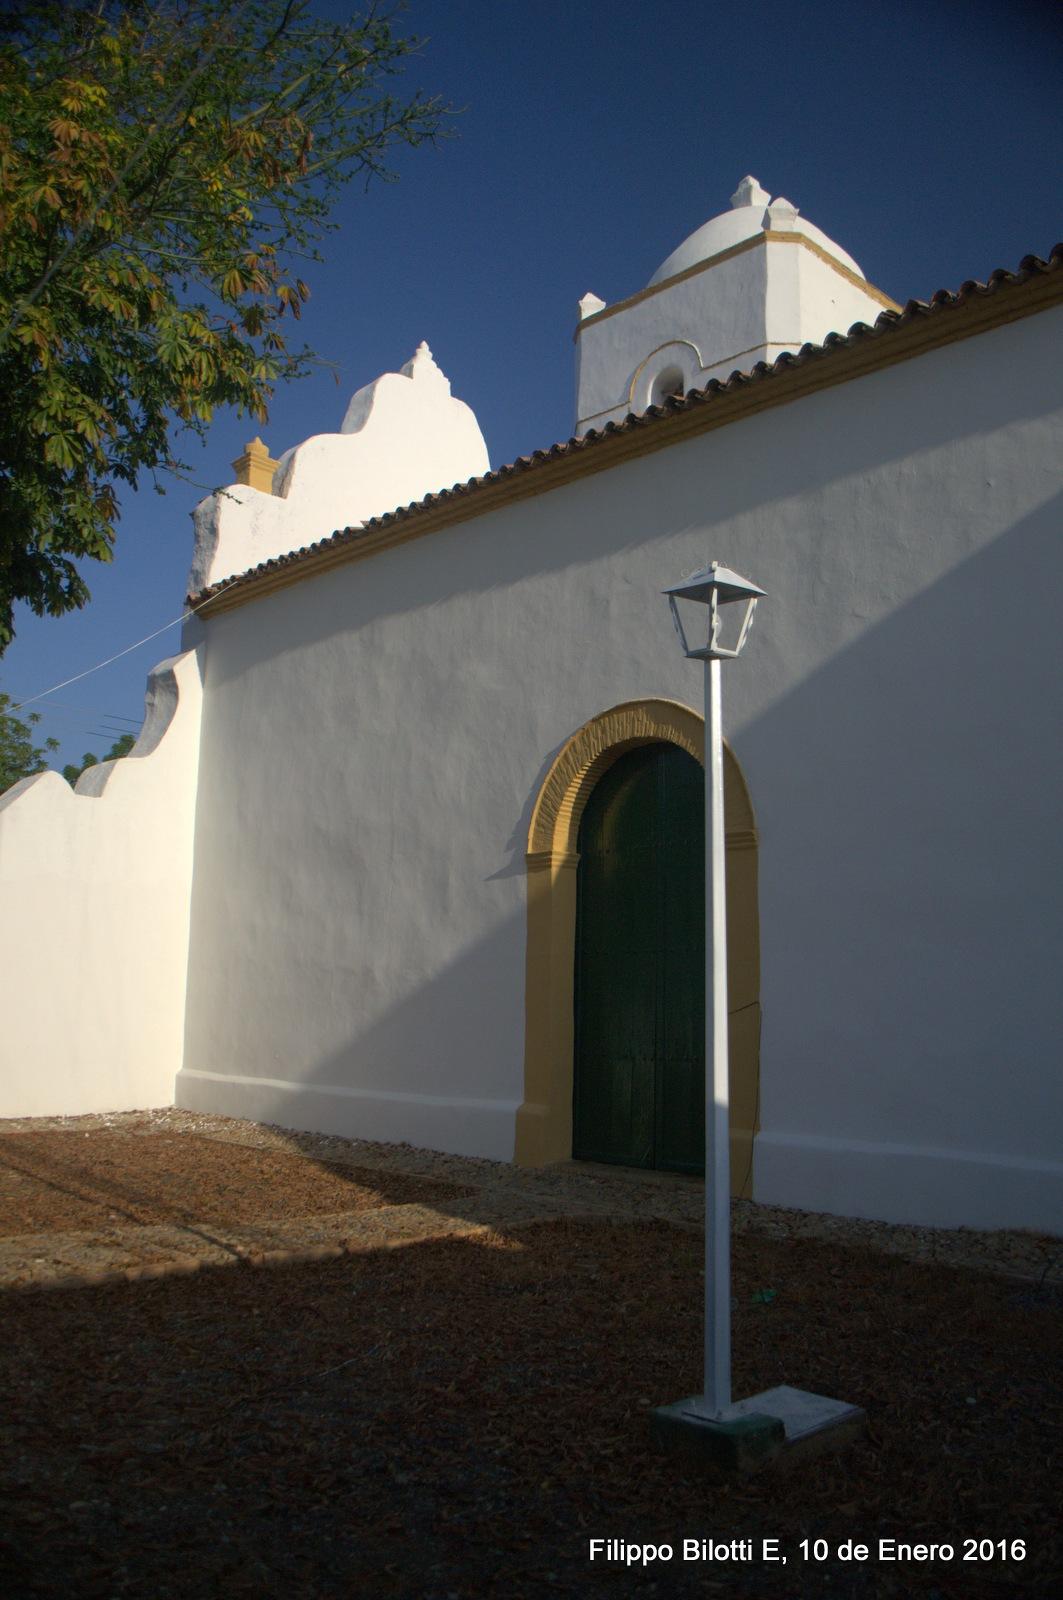 Puerta y farol,iglesia de las Mercedes. by FilippoBilottiE